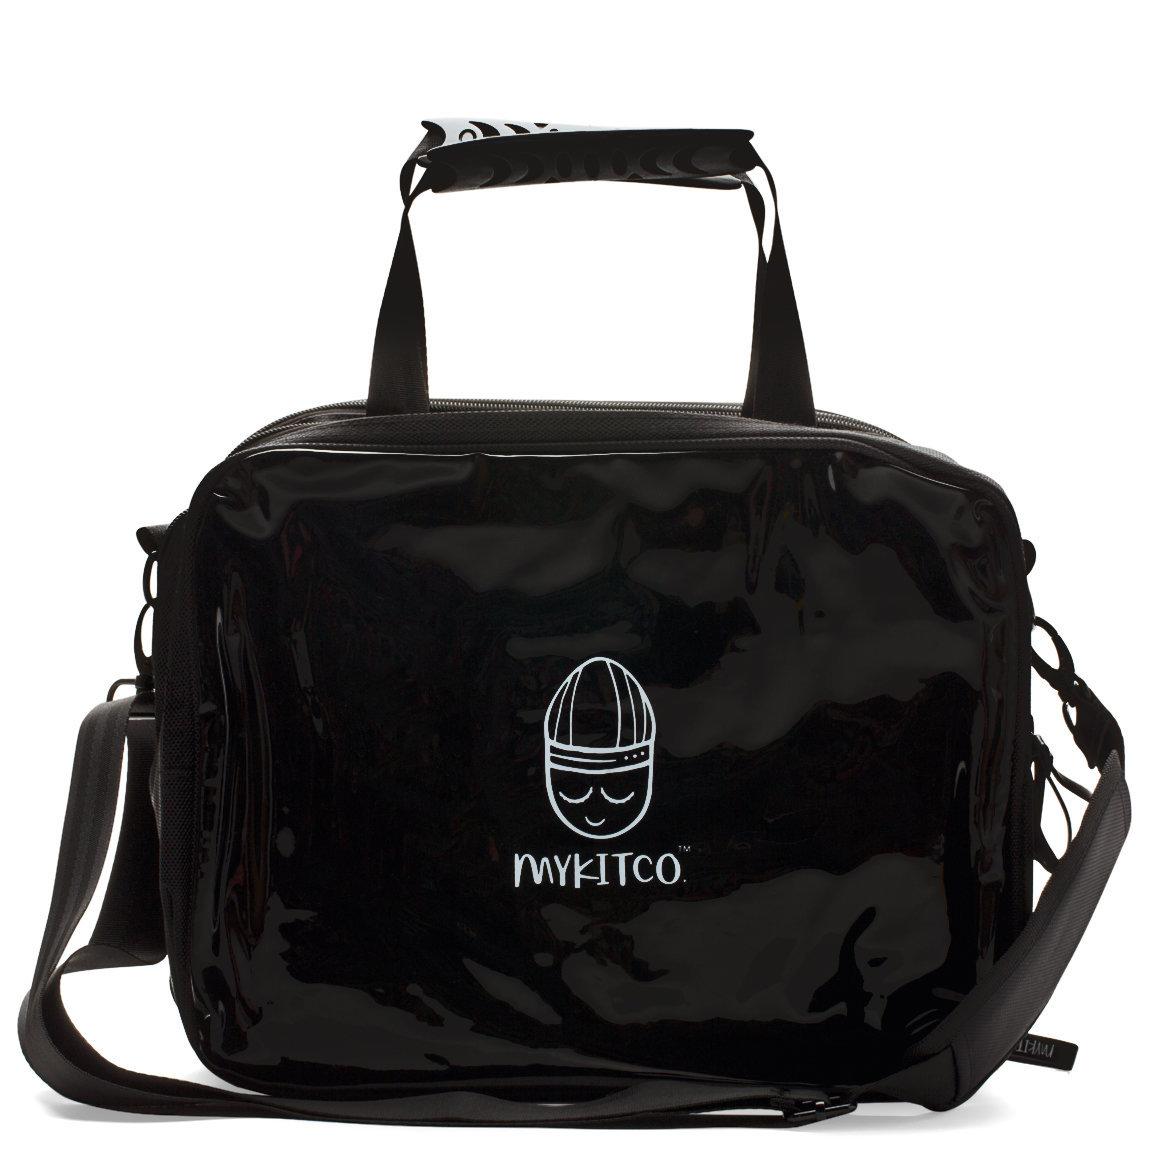 MYKITCO. My Travel Buddy product swatch.